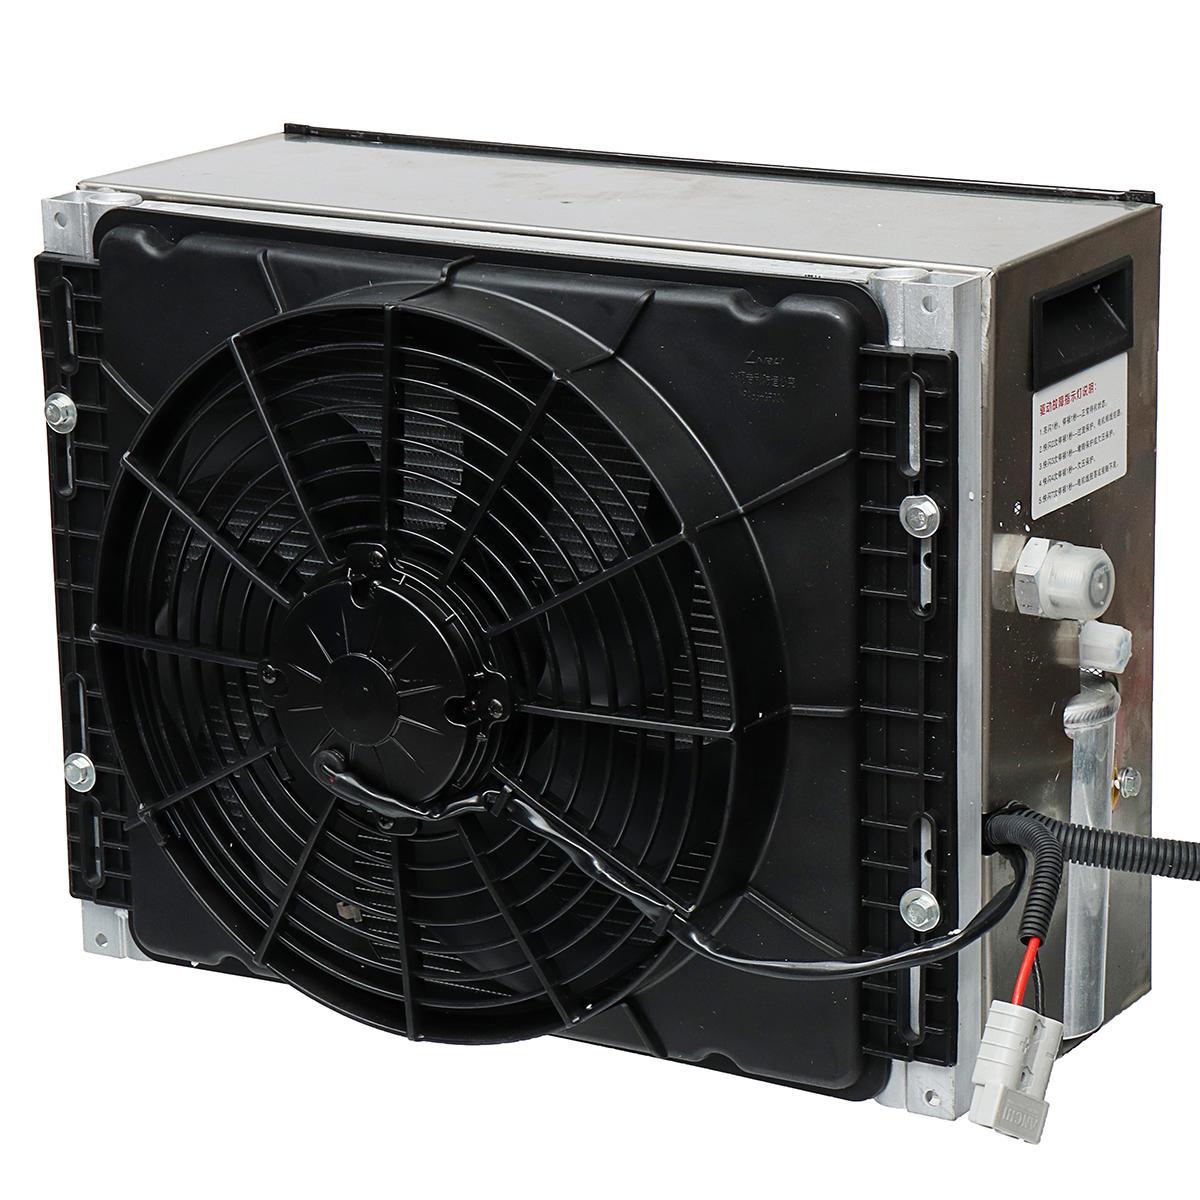 Us 1 168 09 12v Air Conditioner Kit Evaporator Compressor Refrigerating Machine For Car Caravan Truck Conditioner Evaporator Compressor Electrical Equipment Caravan 12v Air Conditioner